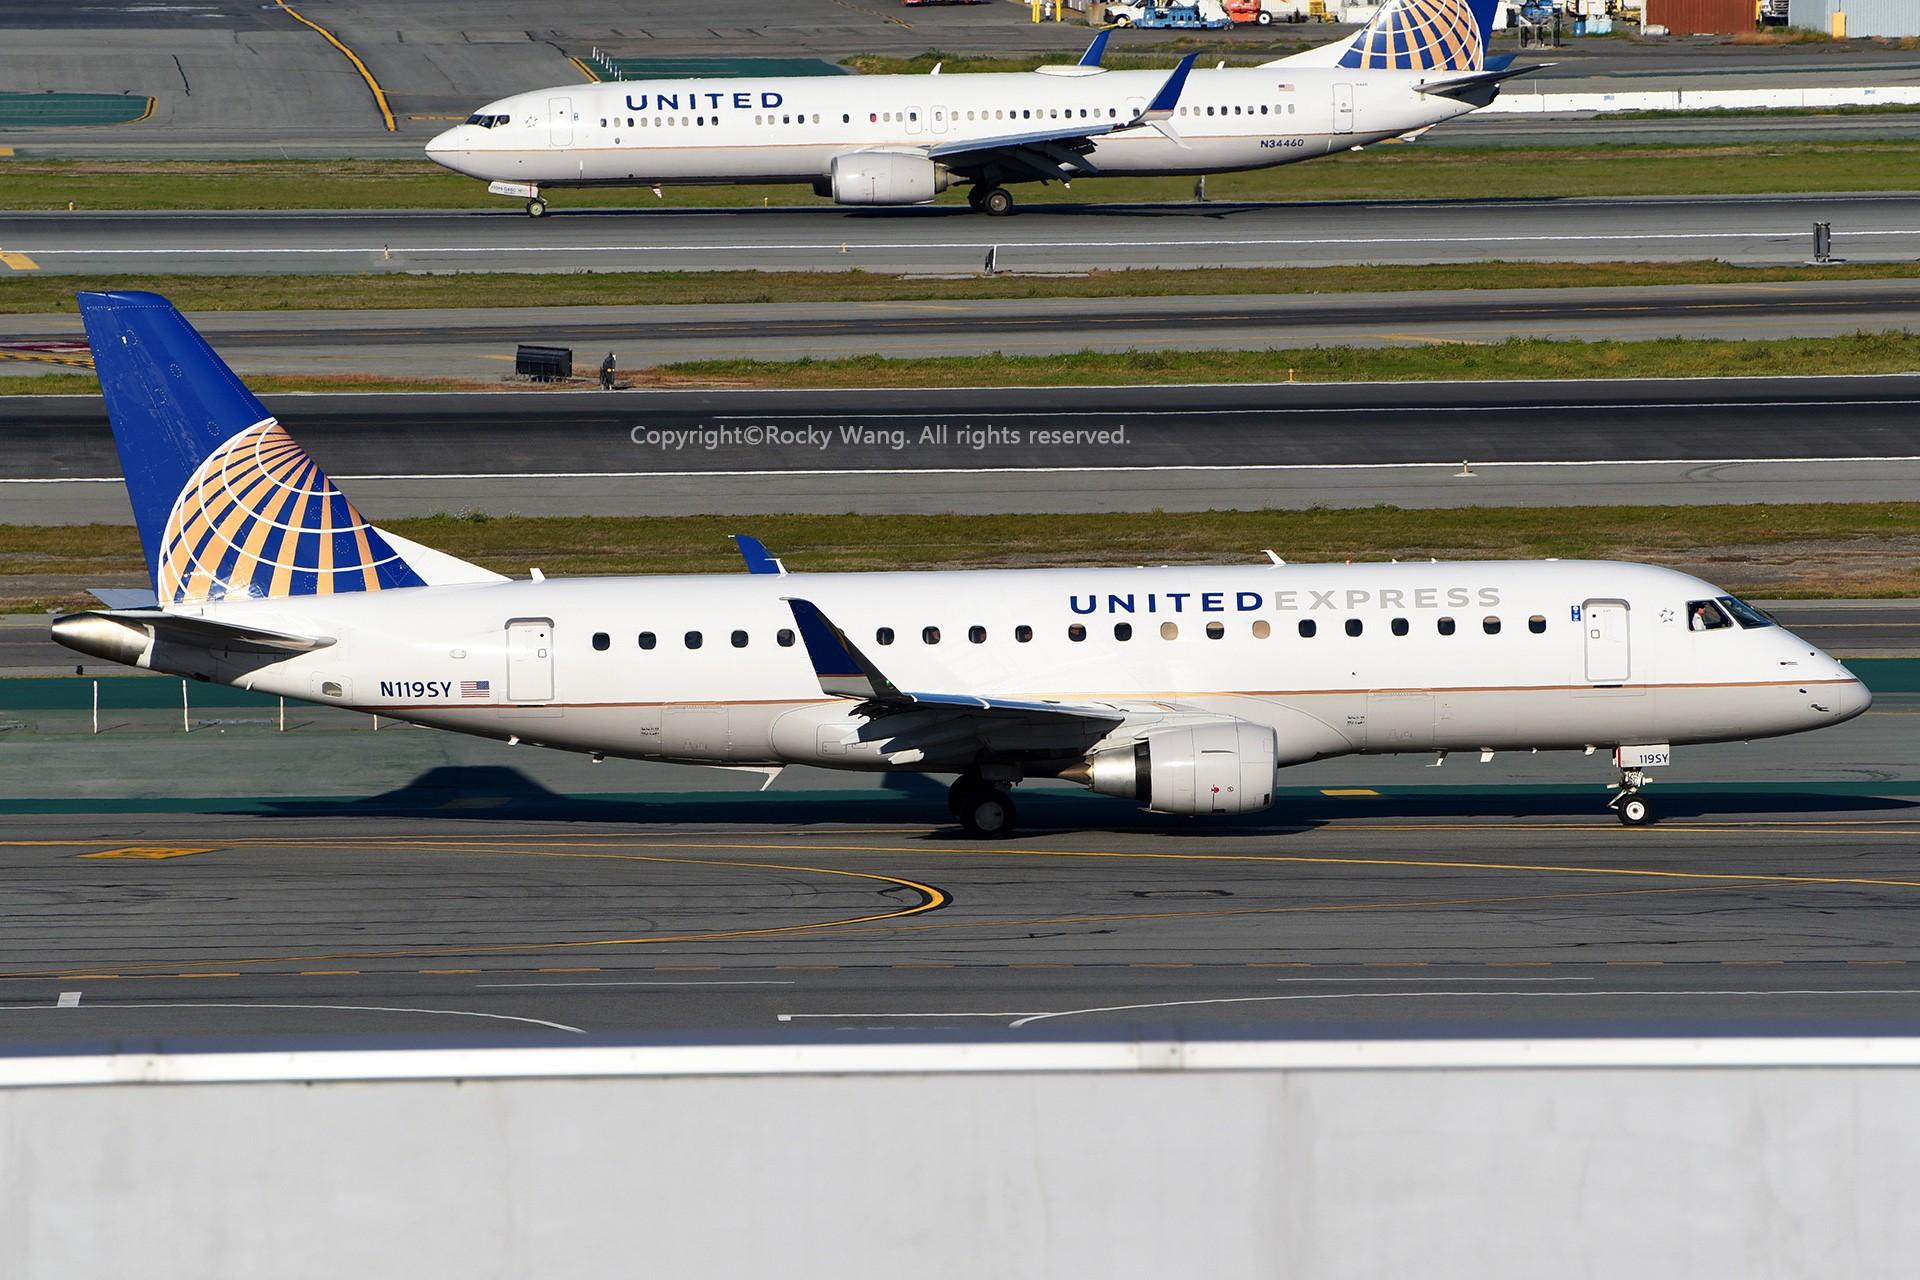 Re:[原创]窄体连连看 EMBRAER 170-200LR N119SY 美国旧金山机场